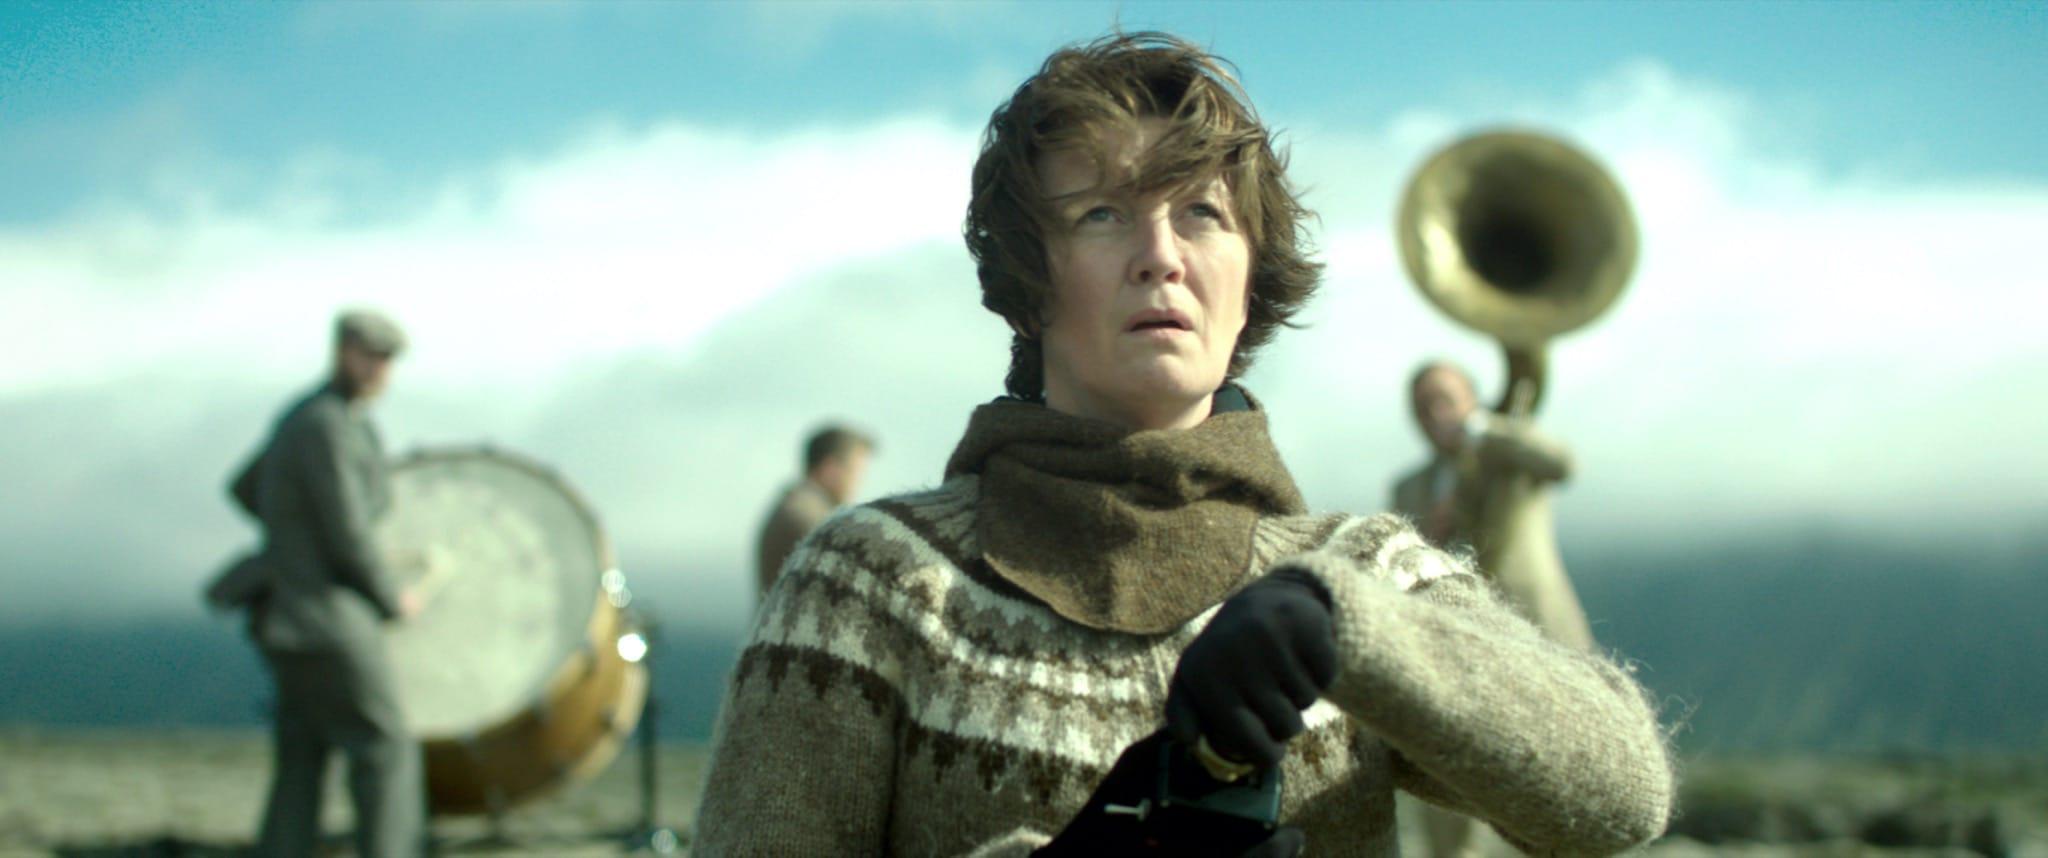 Woman at War de Benedikt Erlingsson image film cinéma